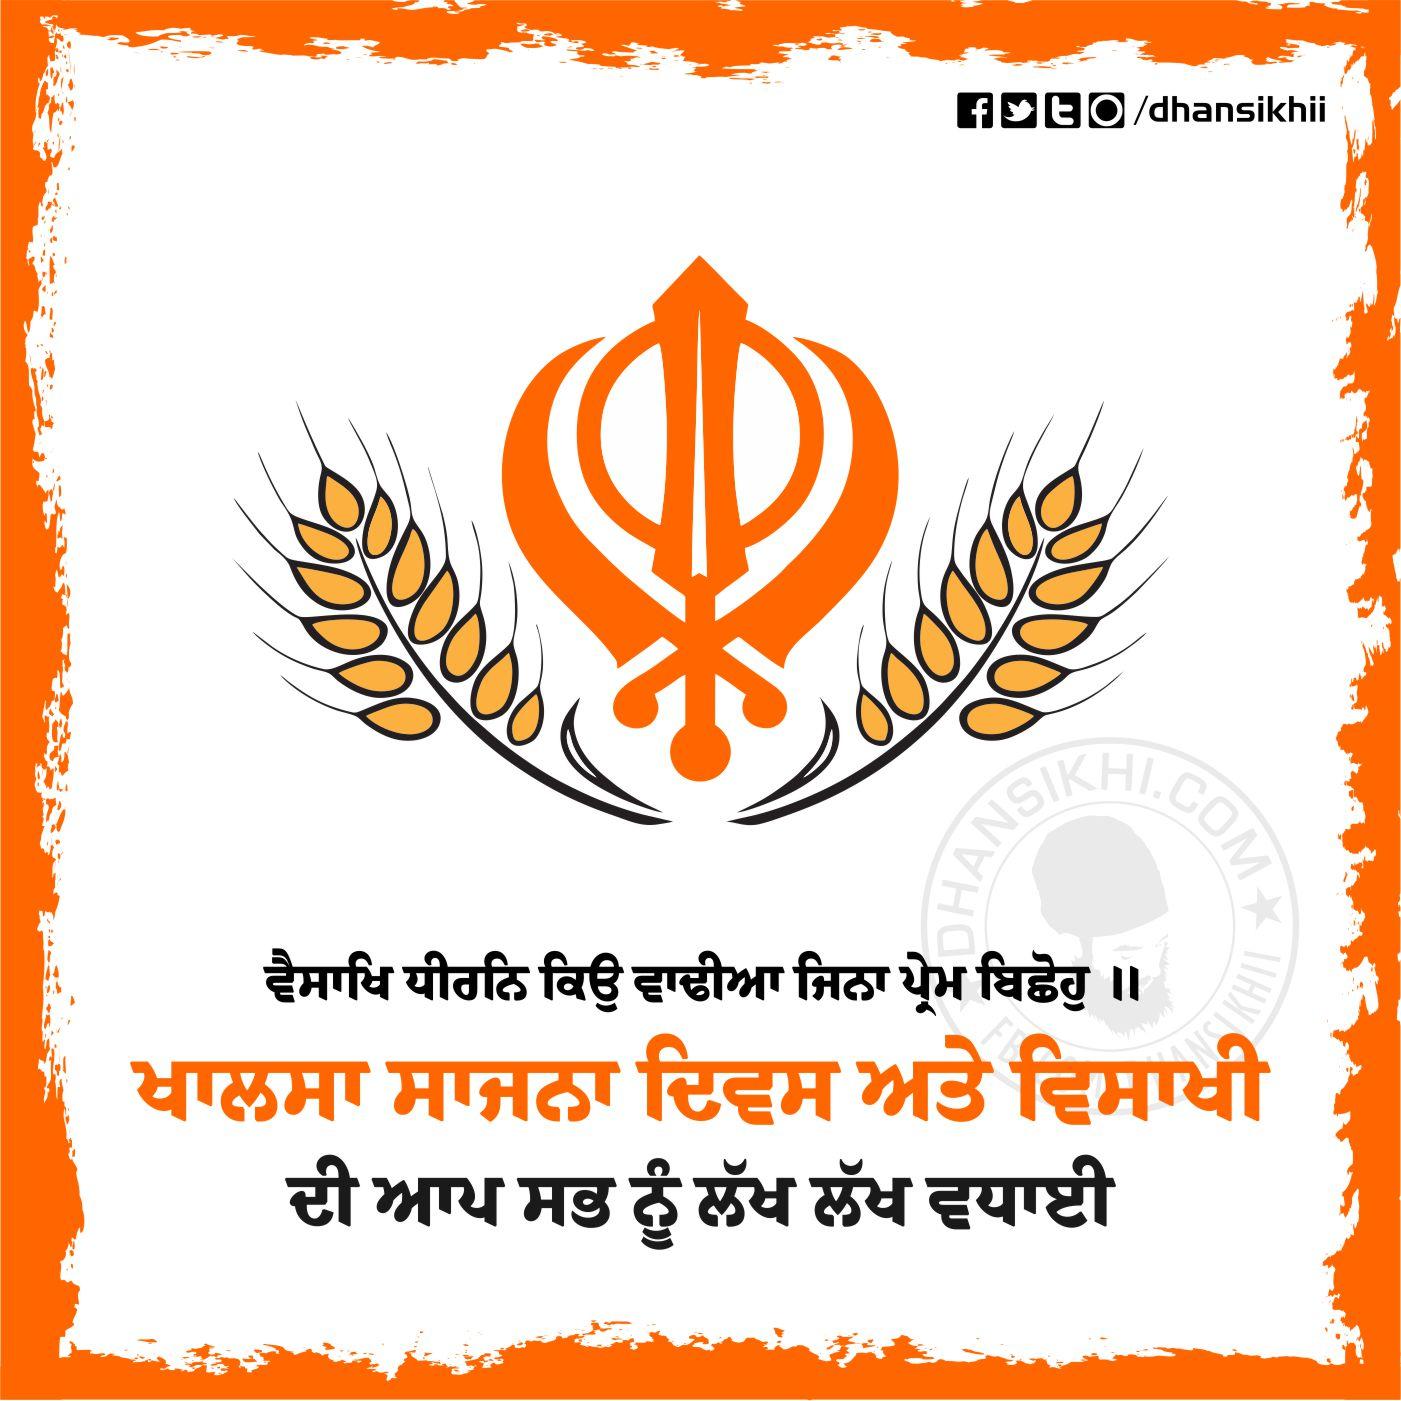 Khalsa Sajna Divas Vaisakhi Wishes And Greetings